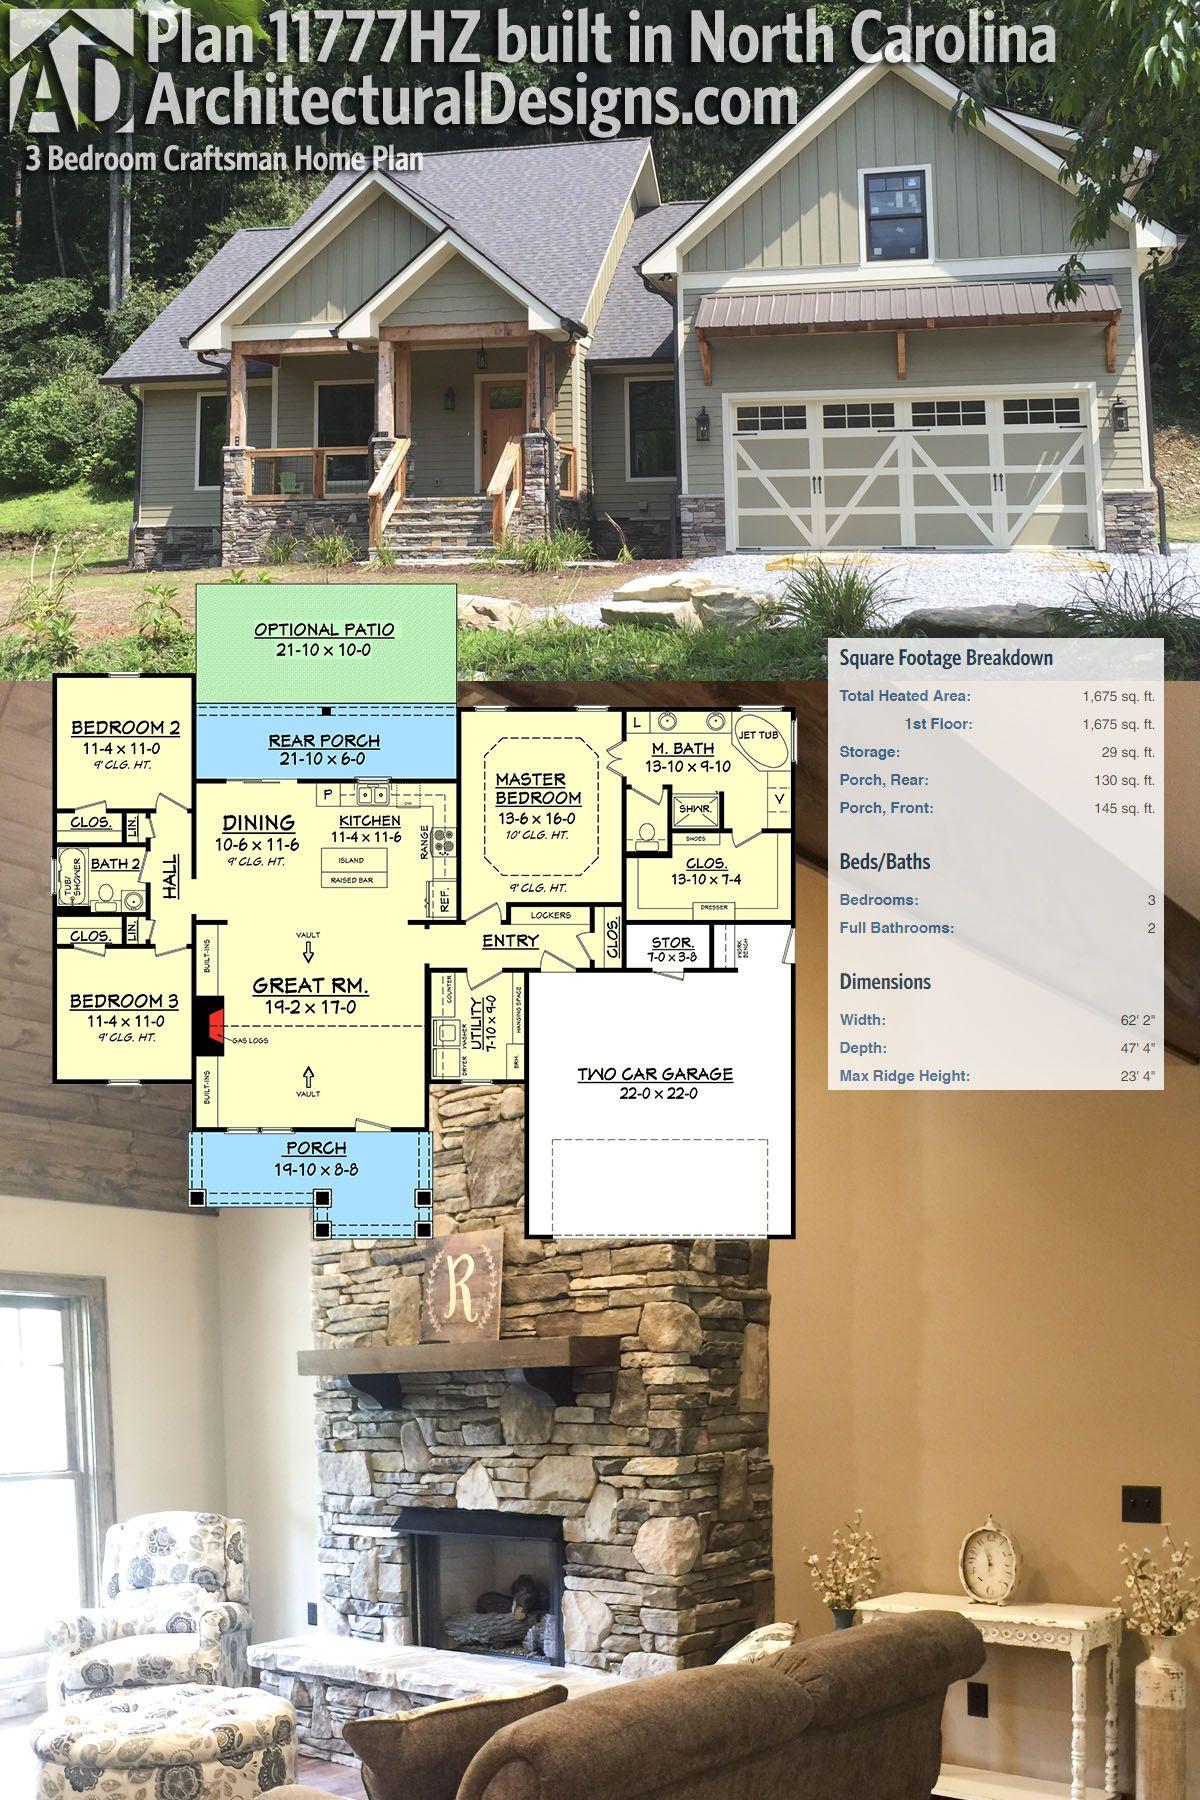 Plan hz bedroom craftsman home plan craftsman house plans